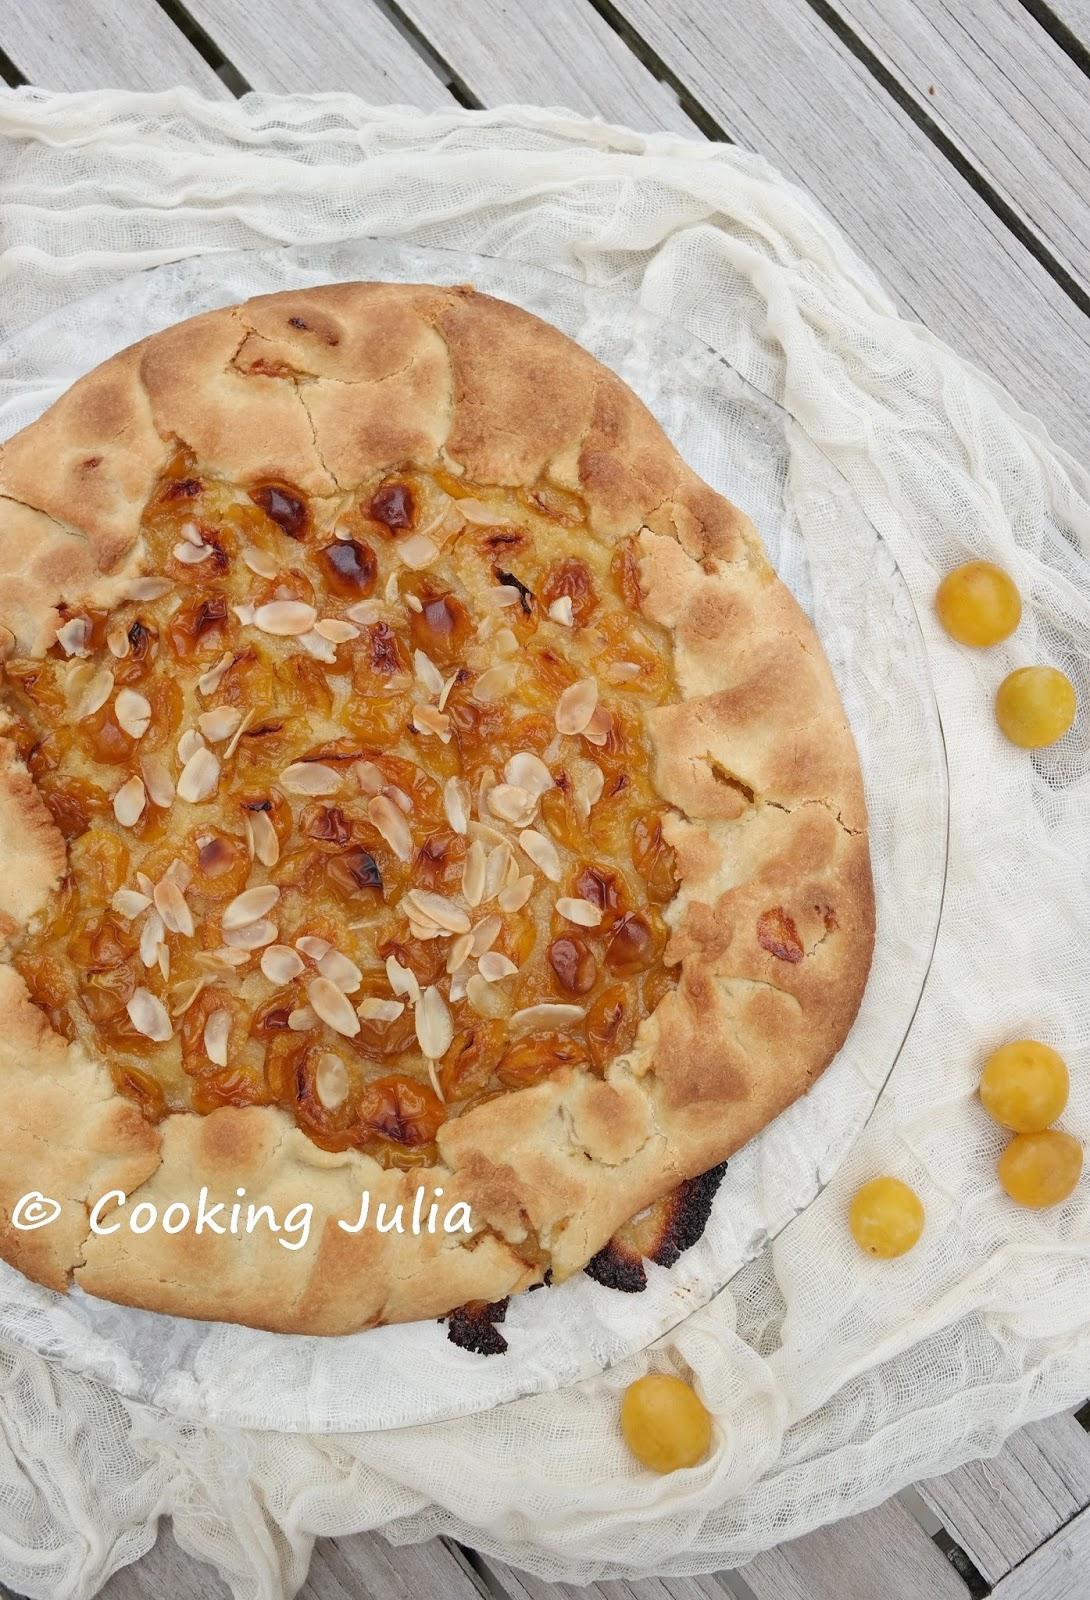 cooking julia tarte rustique aux mirabelles. Black Bedroom Furniture Sets. Home Design Ideas